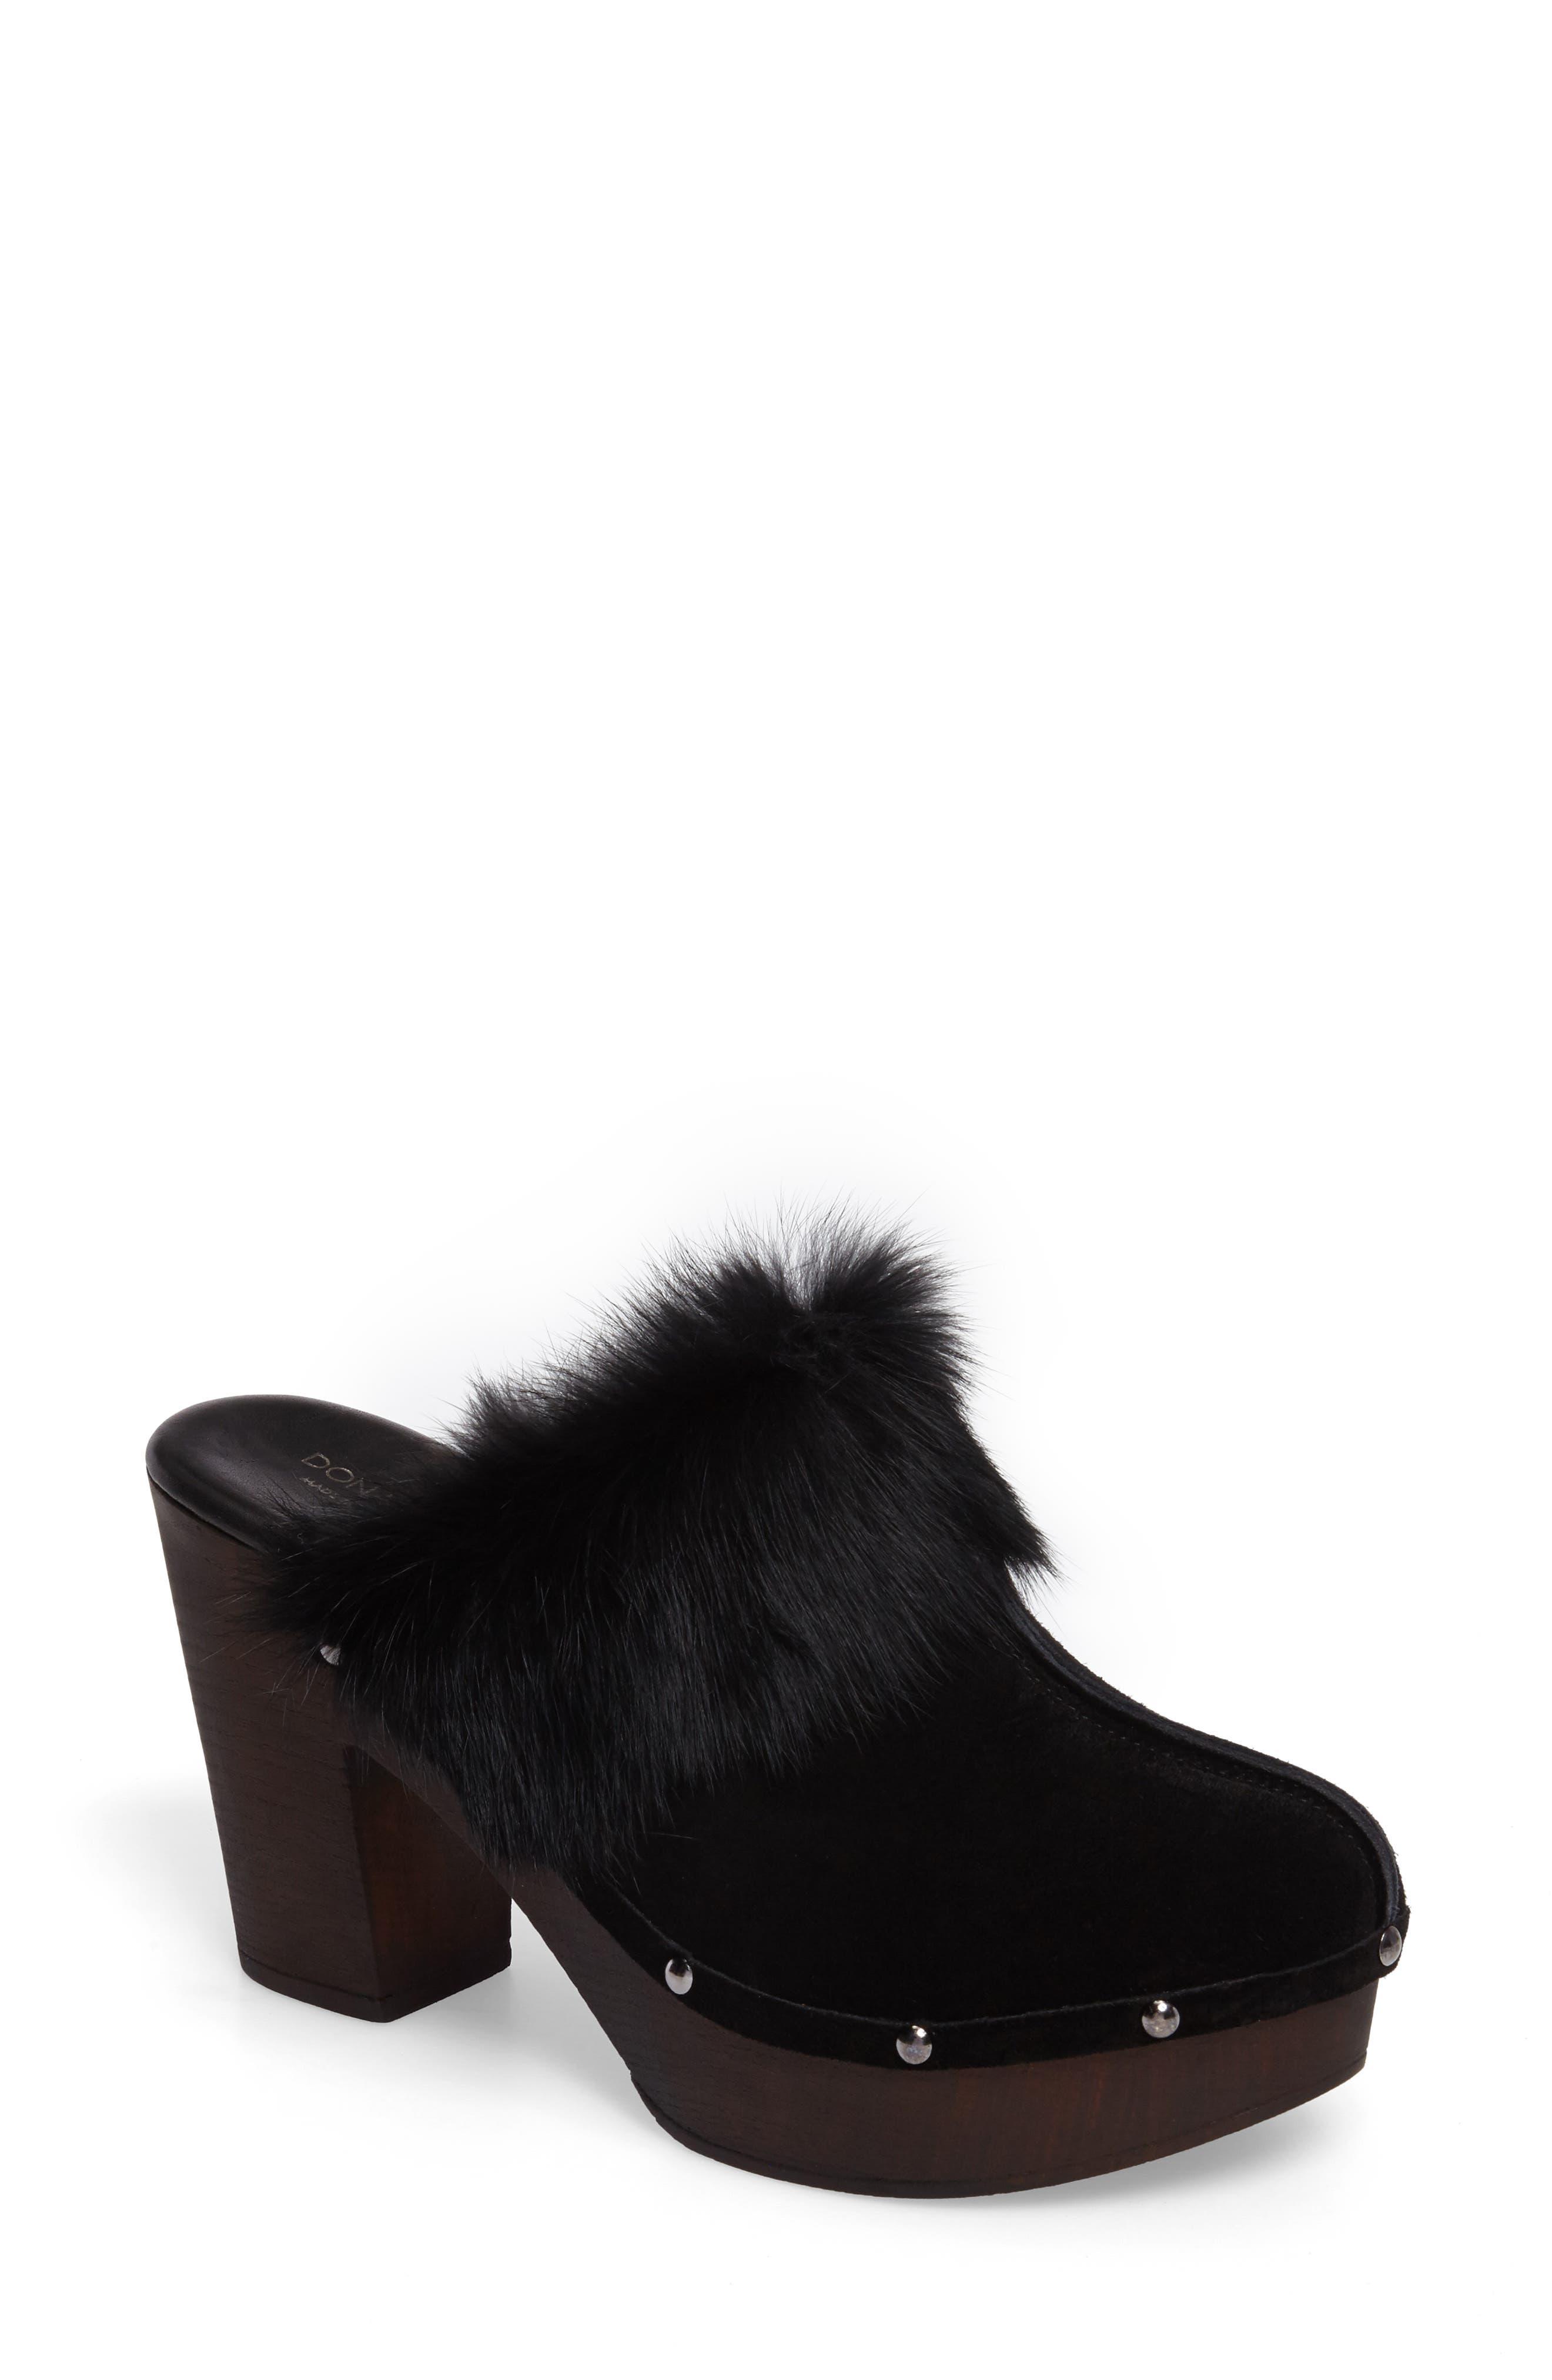 Main Image - Donald J Pliner Willo Genuine Rabbit Fur Mule (Women)